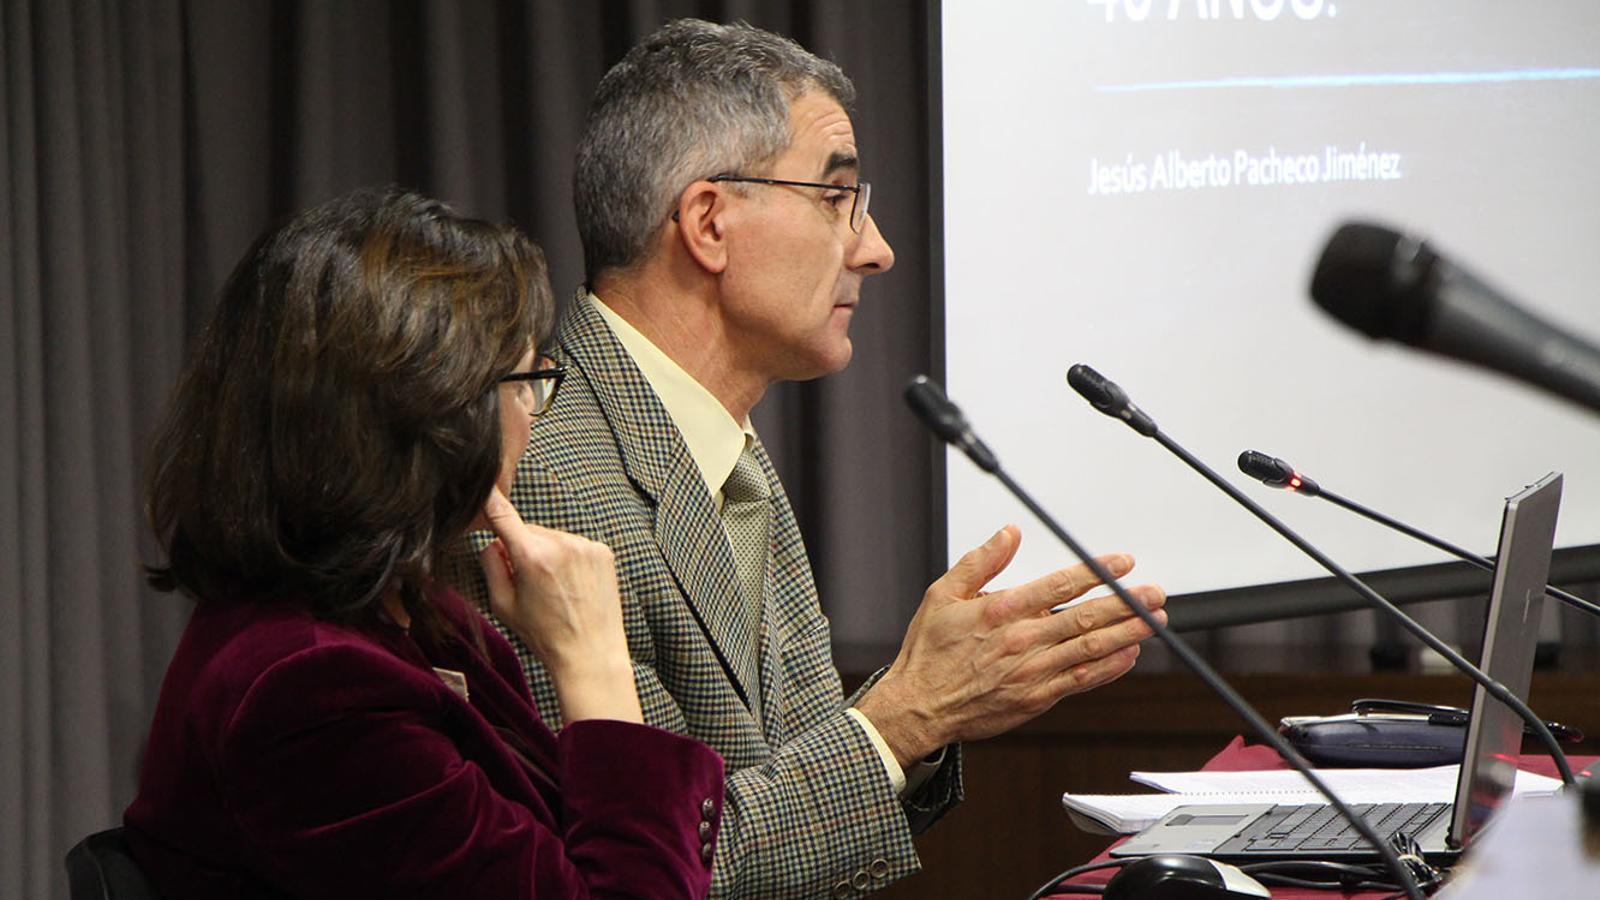 Un moment de la xerrada que ha ofert el doctor Jesús Alberto Pacheco. / M. F. (ANA)